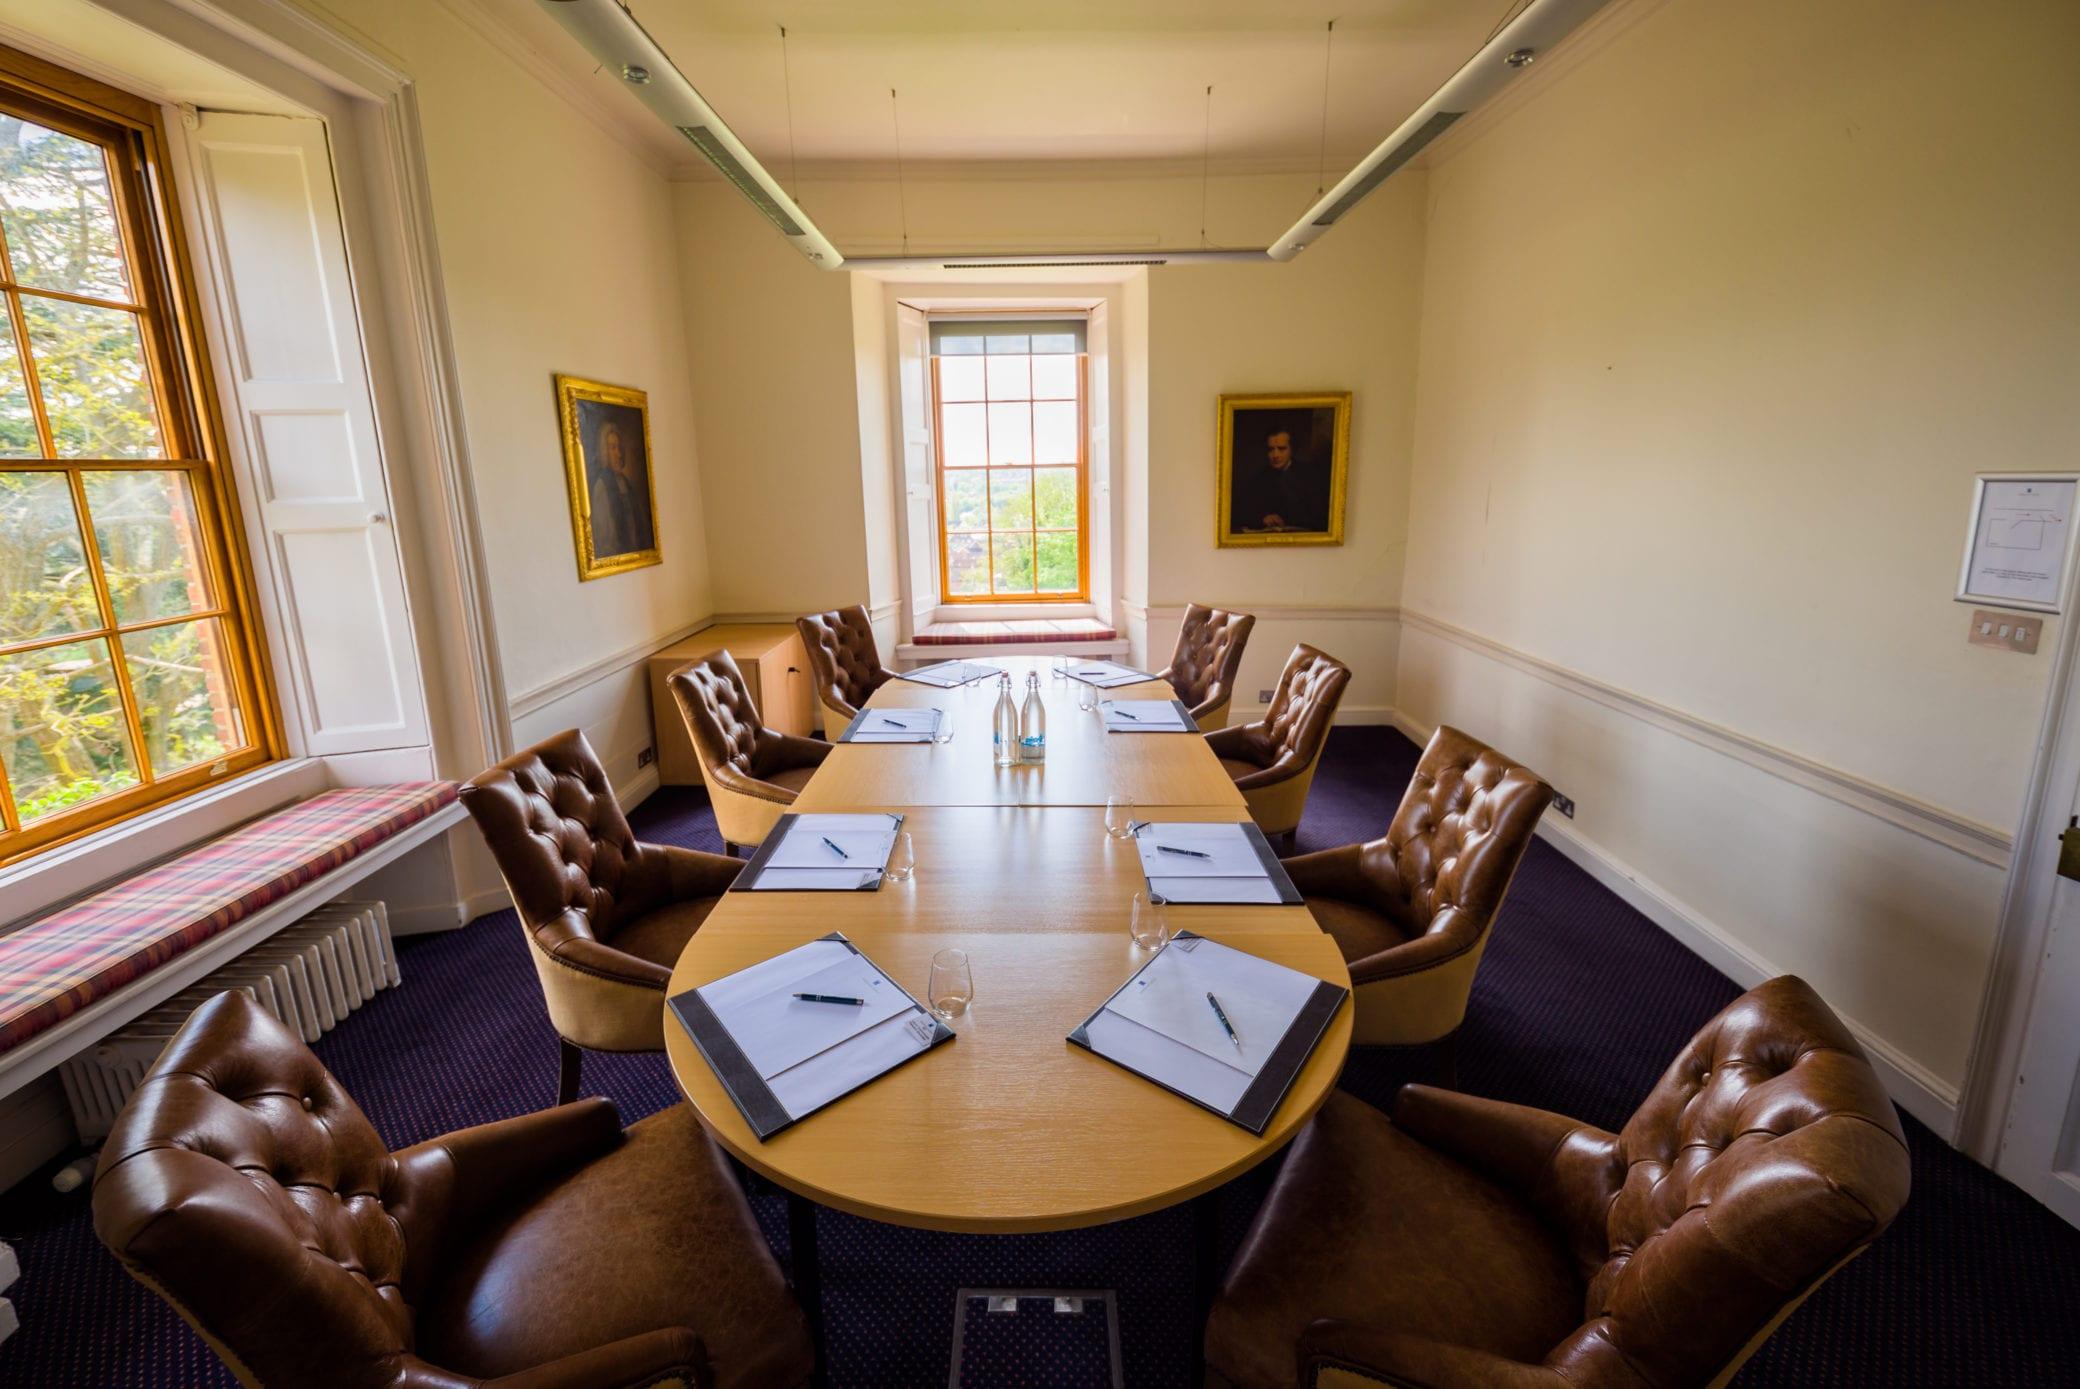 Business meeting venue in Surrey